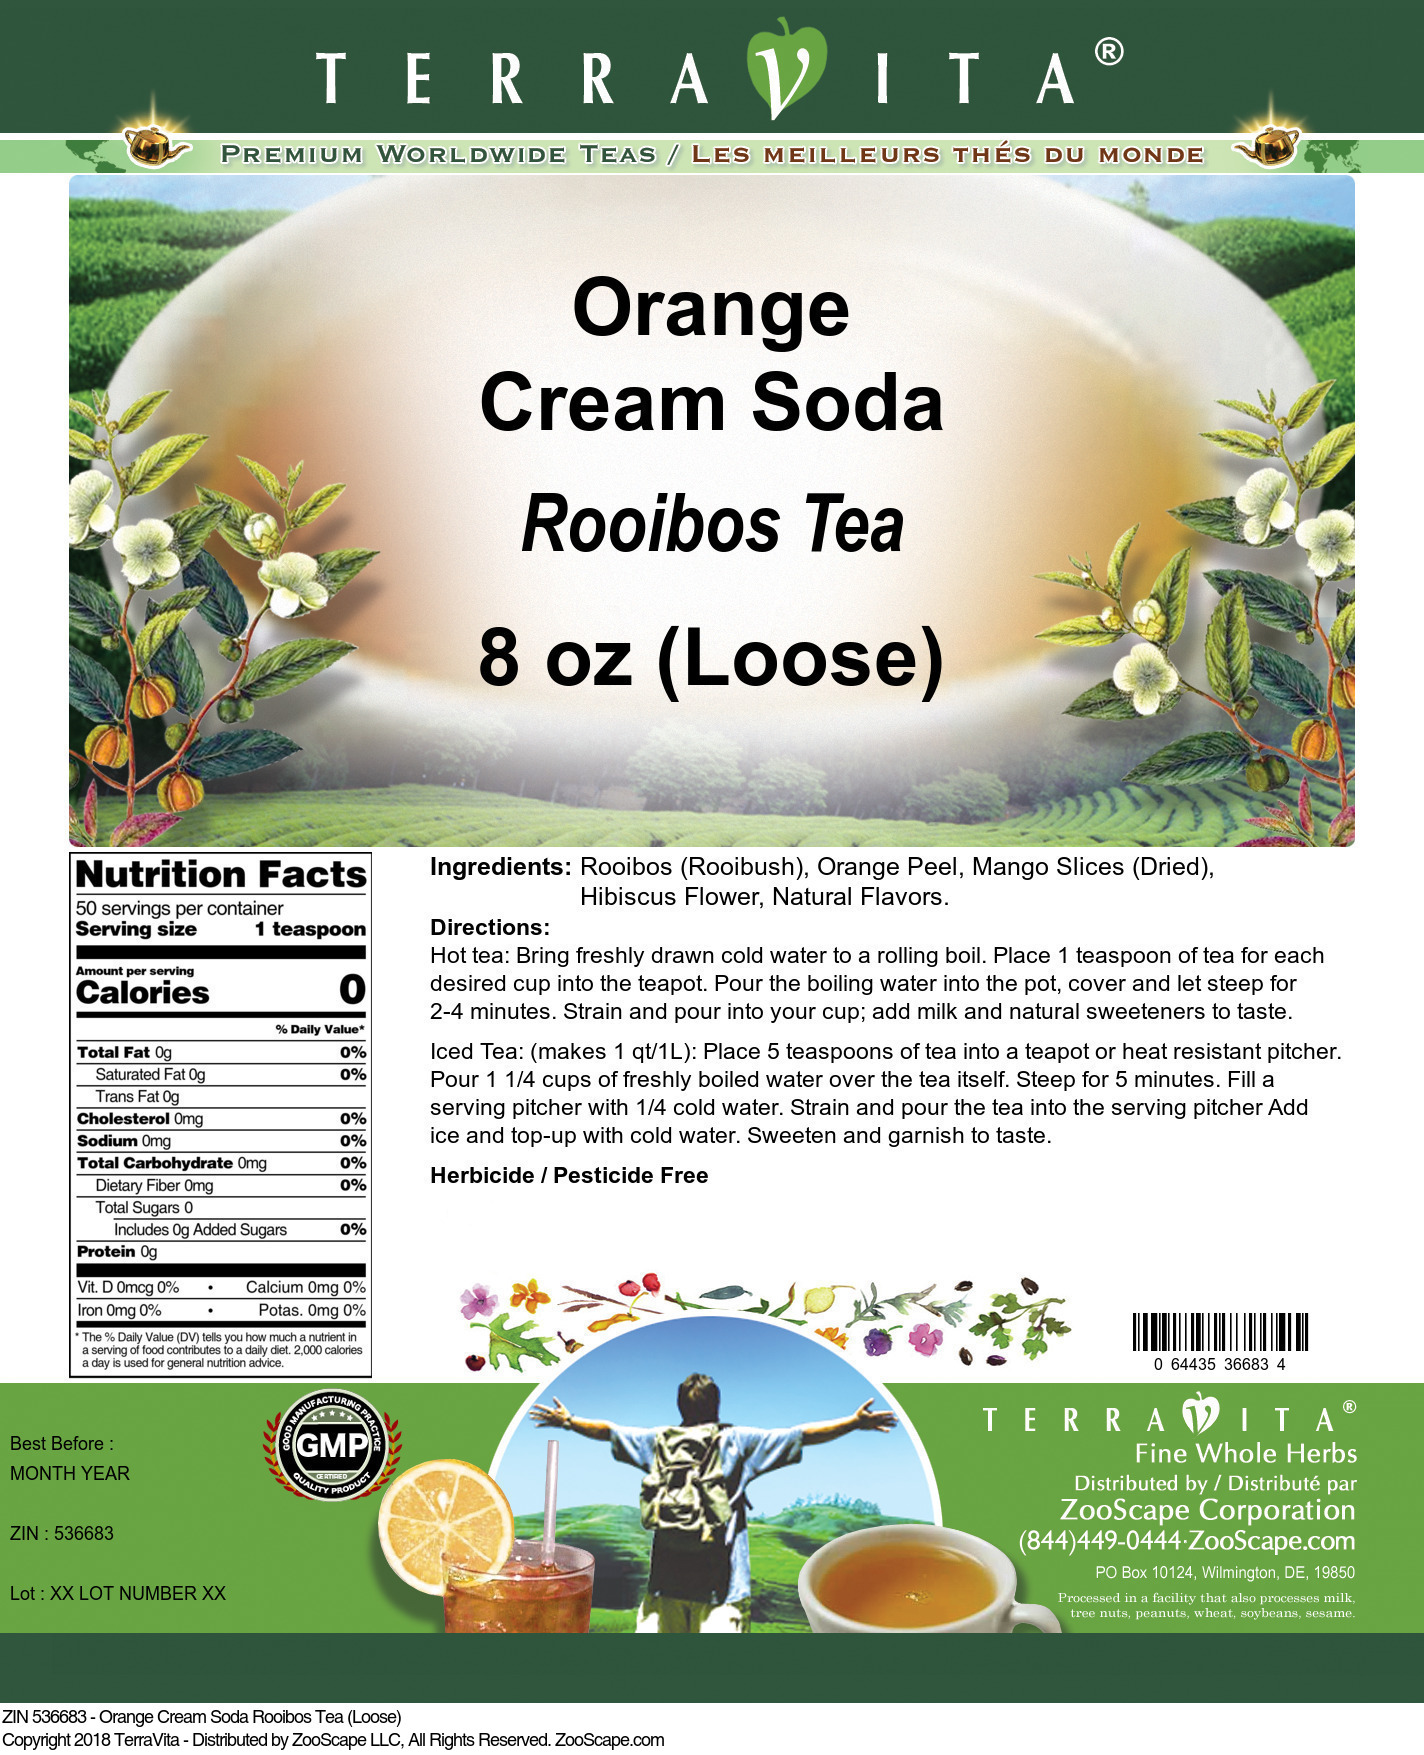 Orange Cream Soda Rooibos Tea (Loose)